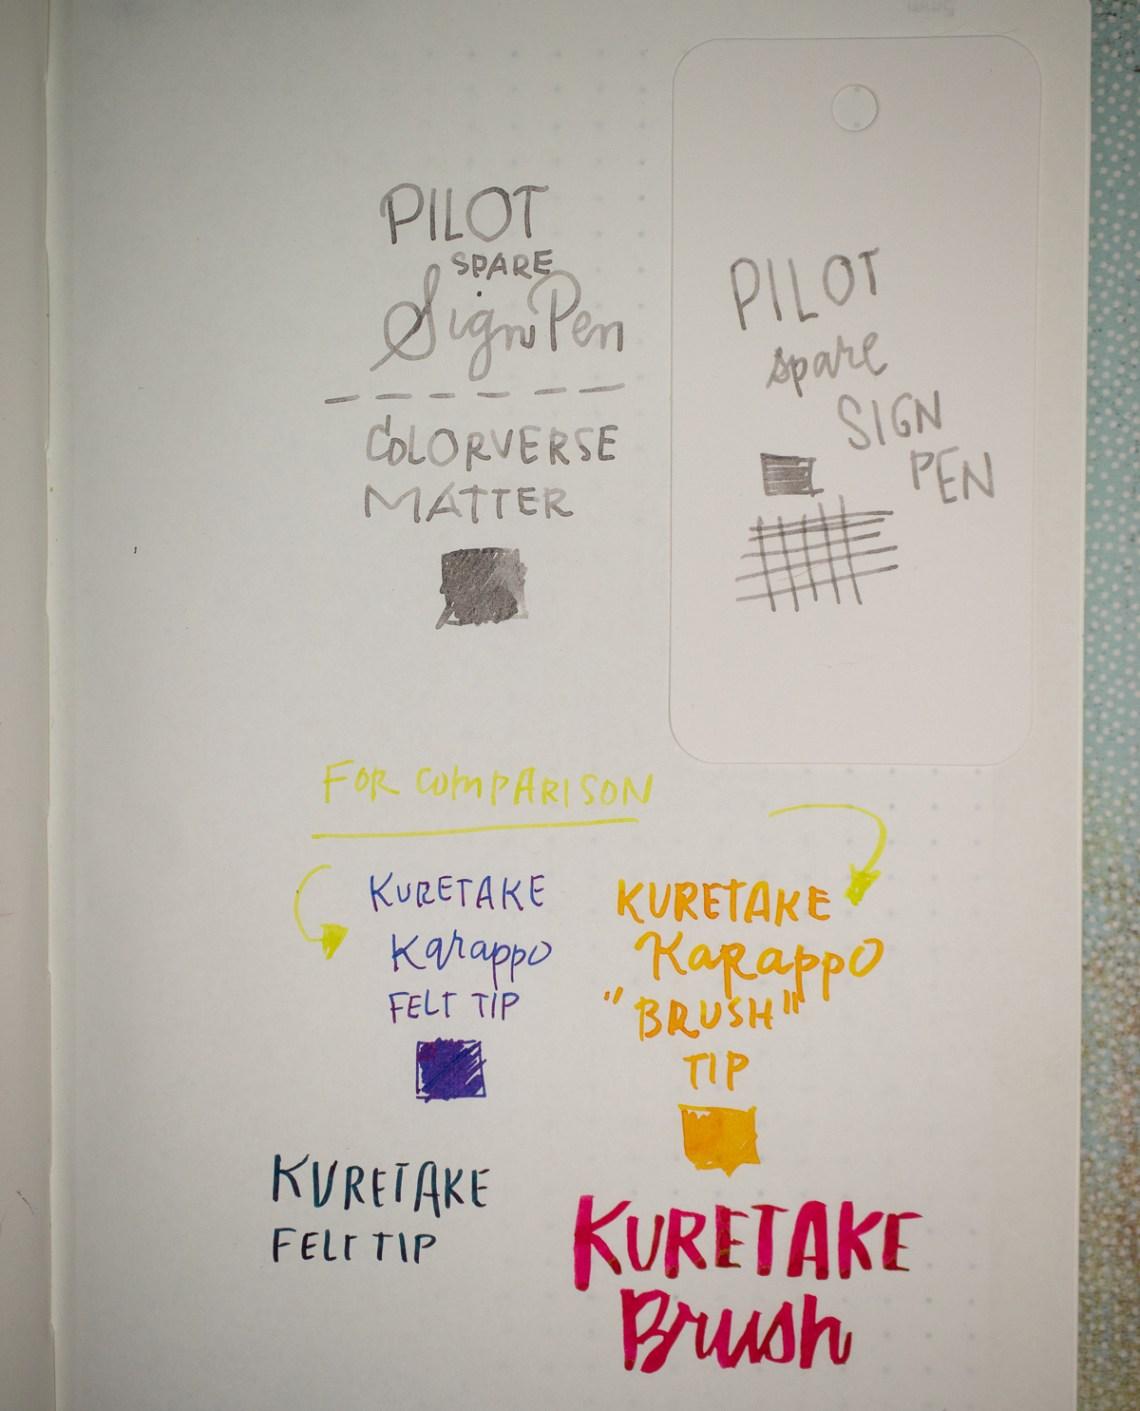 Pilot Spare Pen writing sample